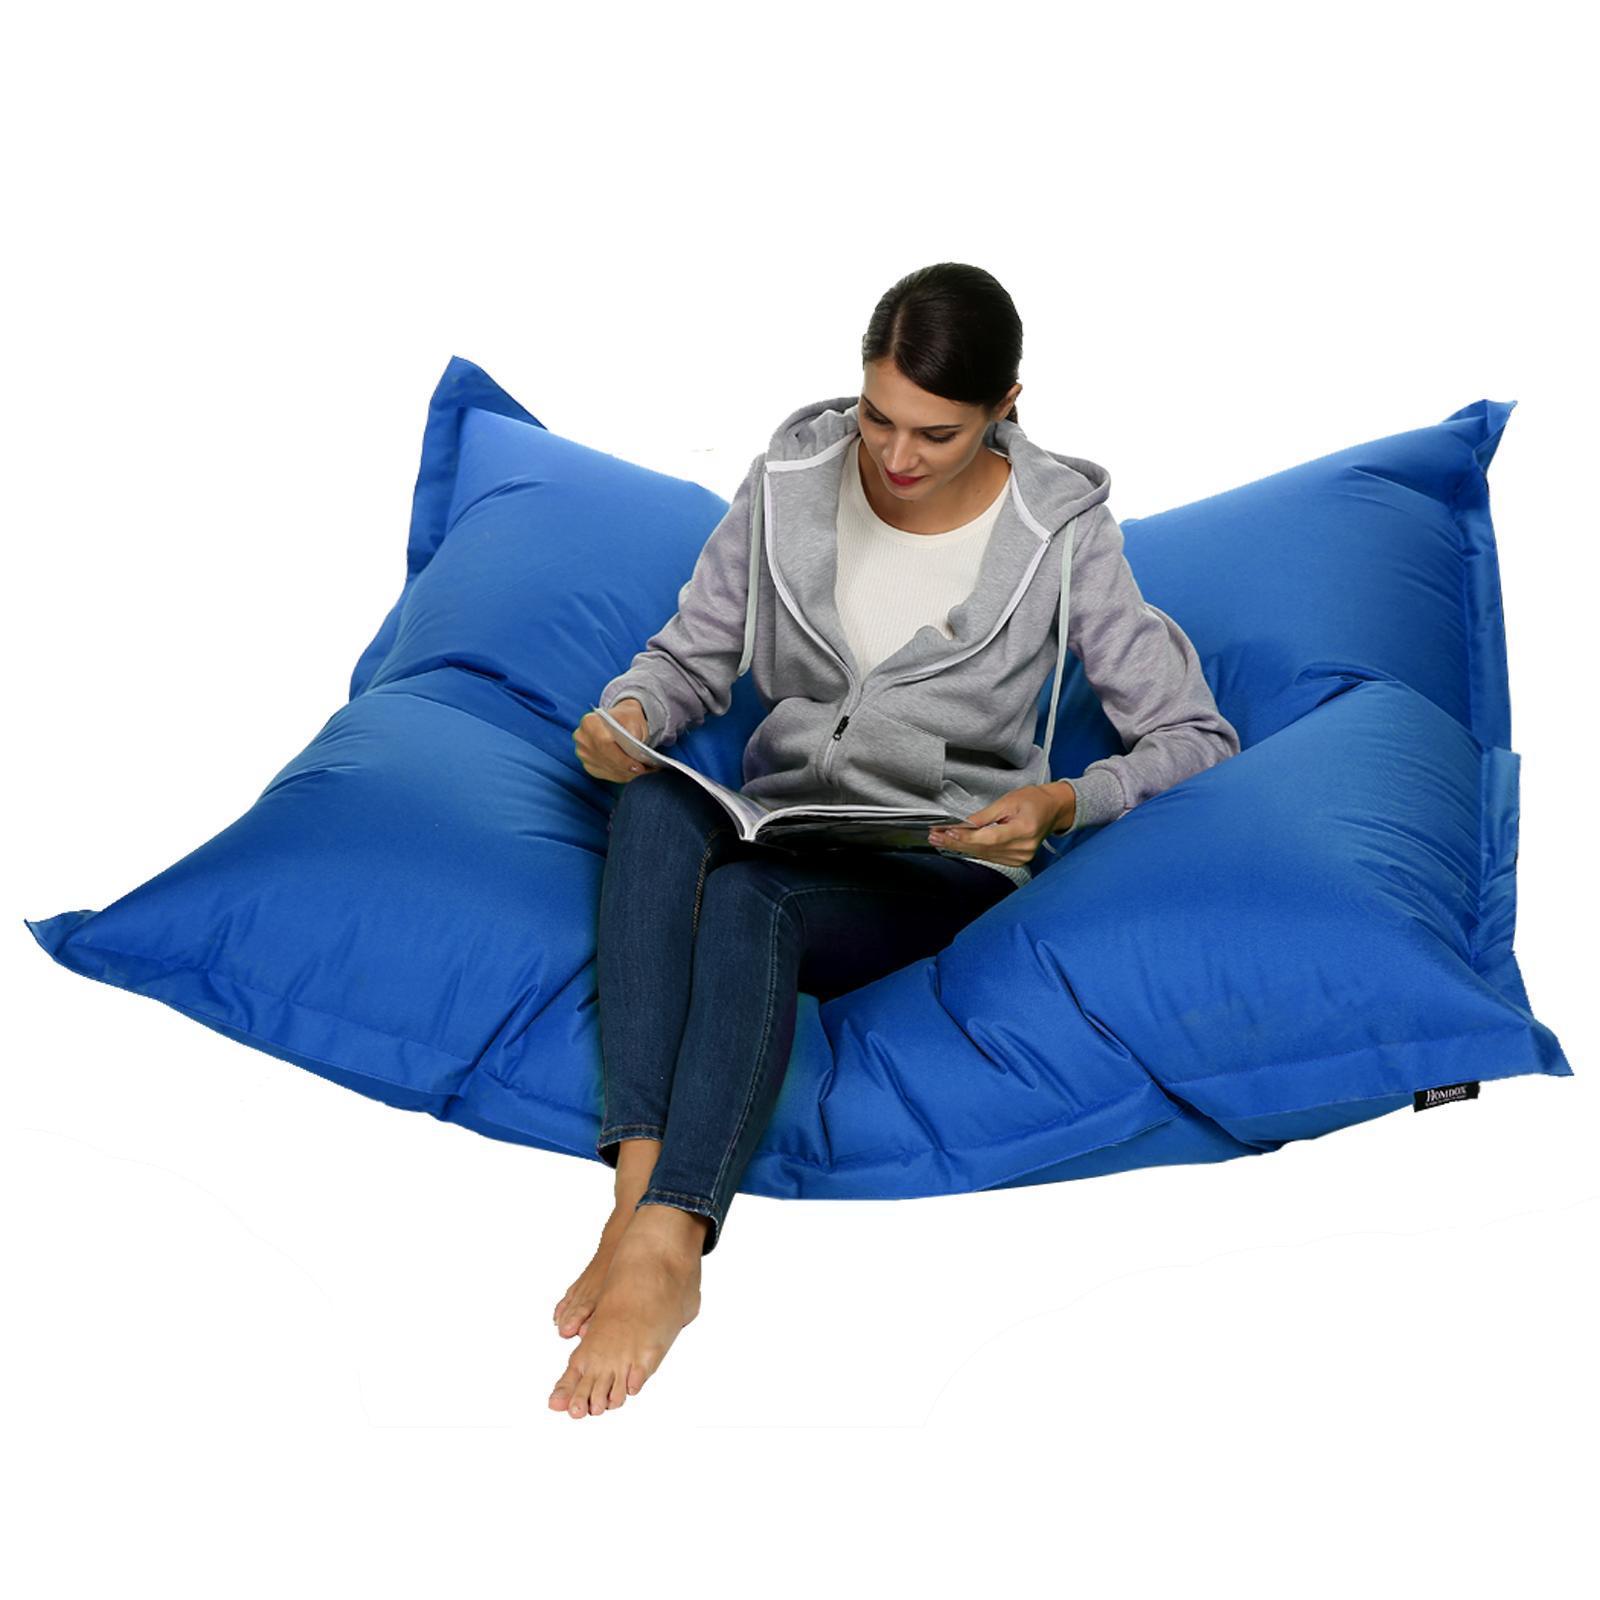 Hot XXL Adult Bean Bag Water Resistant Beanbag Lounger Gamer Cushion Outdoor